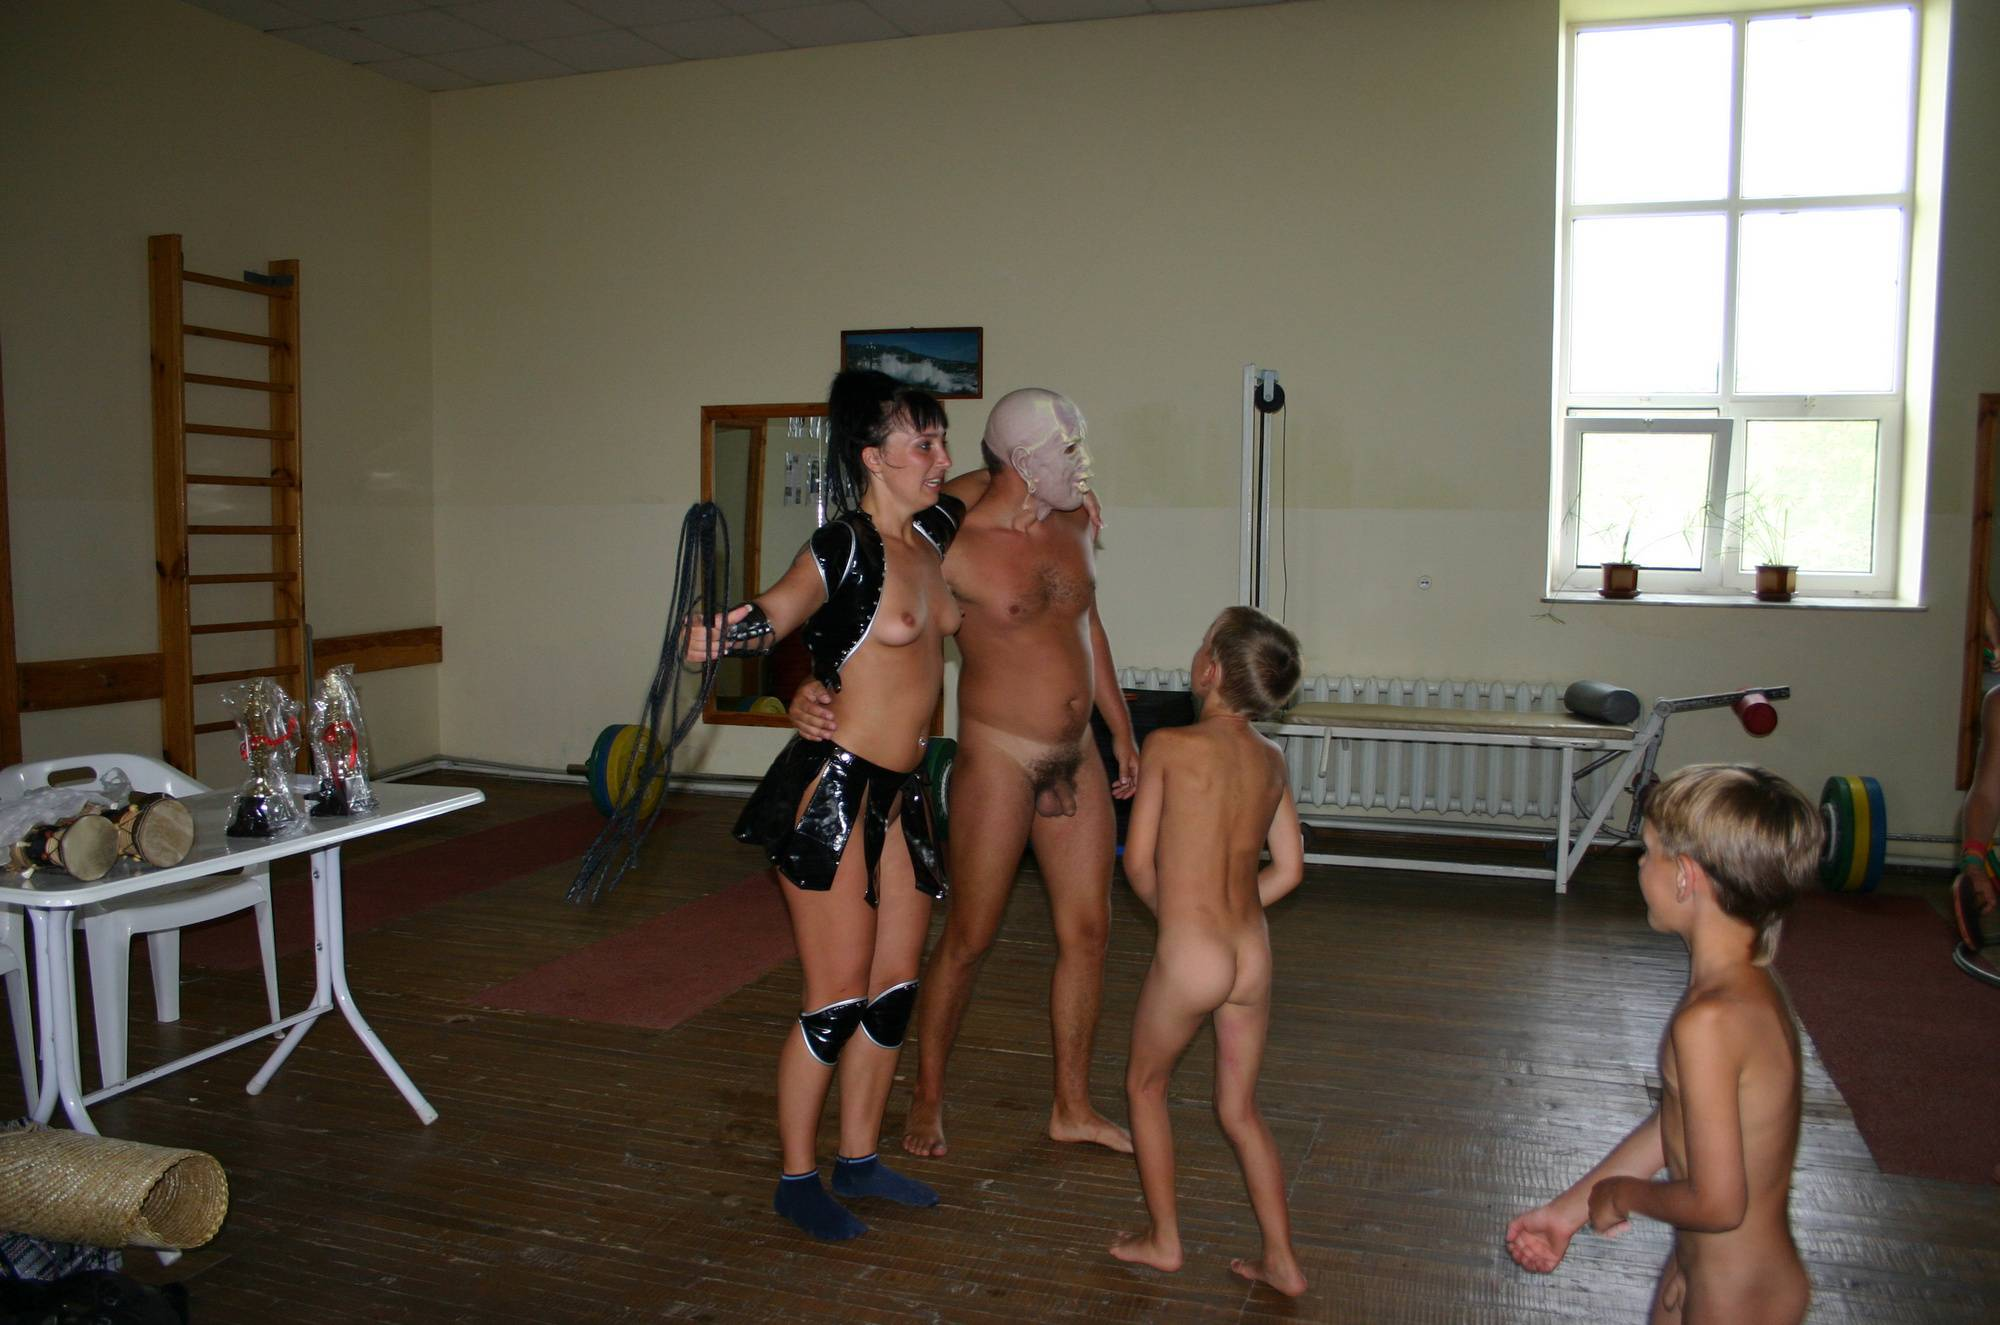 Nudist Pics Family Gym Group Photos - 1